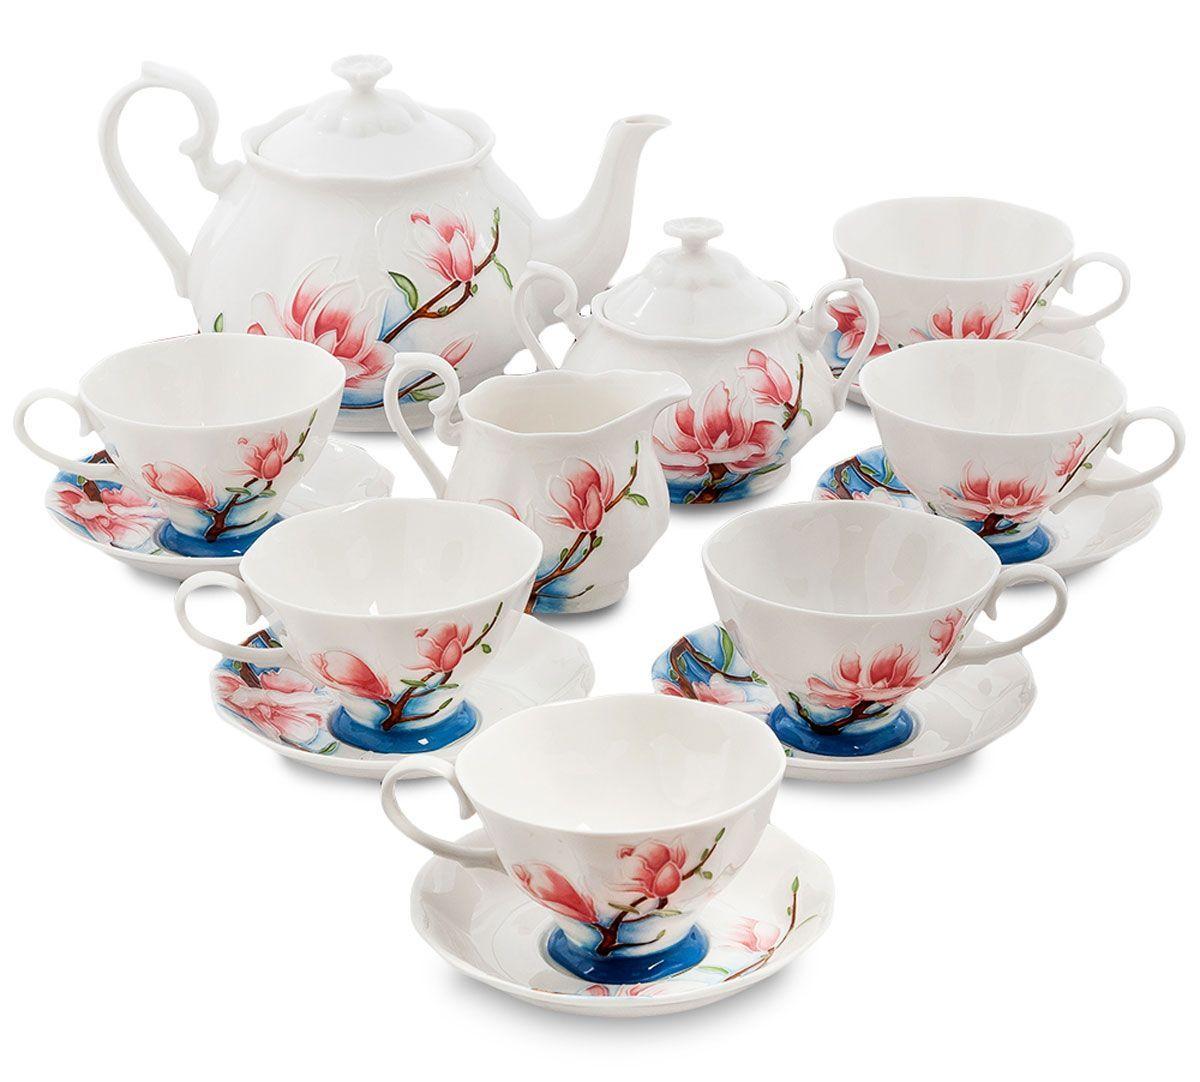 Сервиз чайный Pavone Цветущая сакура, 15 предметов. 451572451572Объем чайника: 1,25 л Объем сахарницы: 400 мл Объем молочника: 250 мл Объем чашки: 200 мл Диаметр блюдца: 14 см.